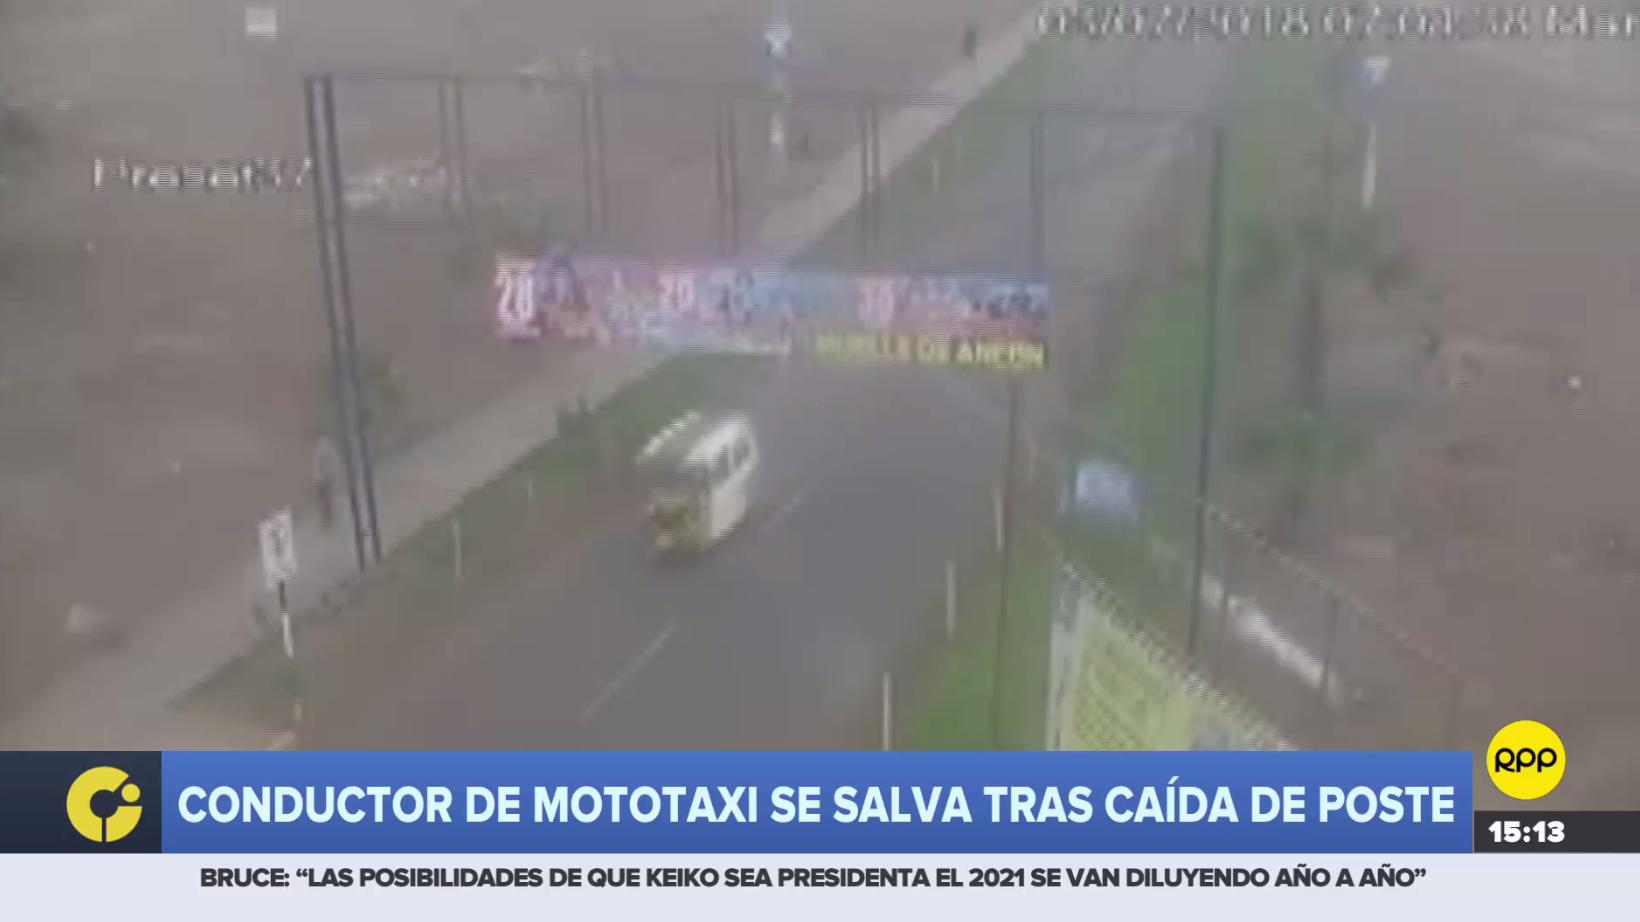 Conductor de mototaxi se salvó tras caída de un poste en Ancón.